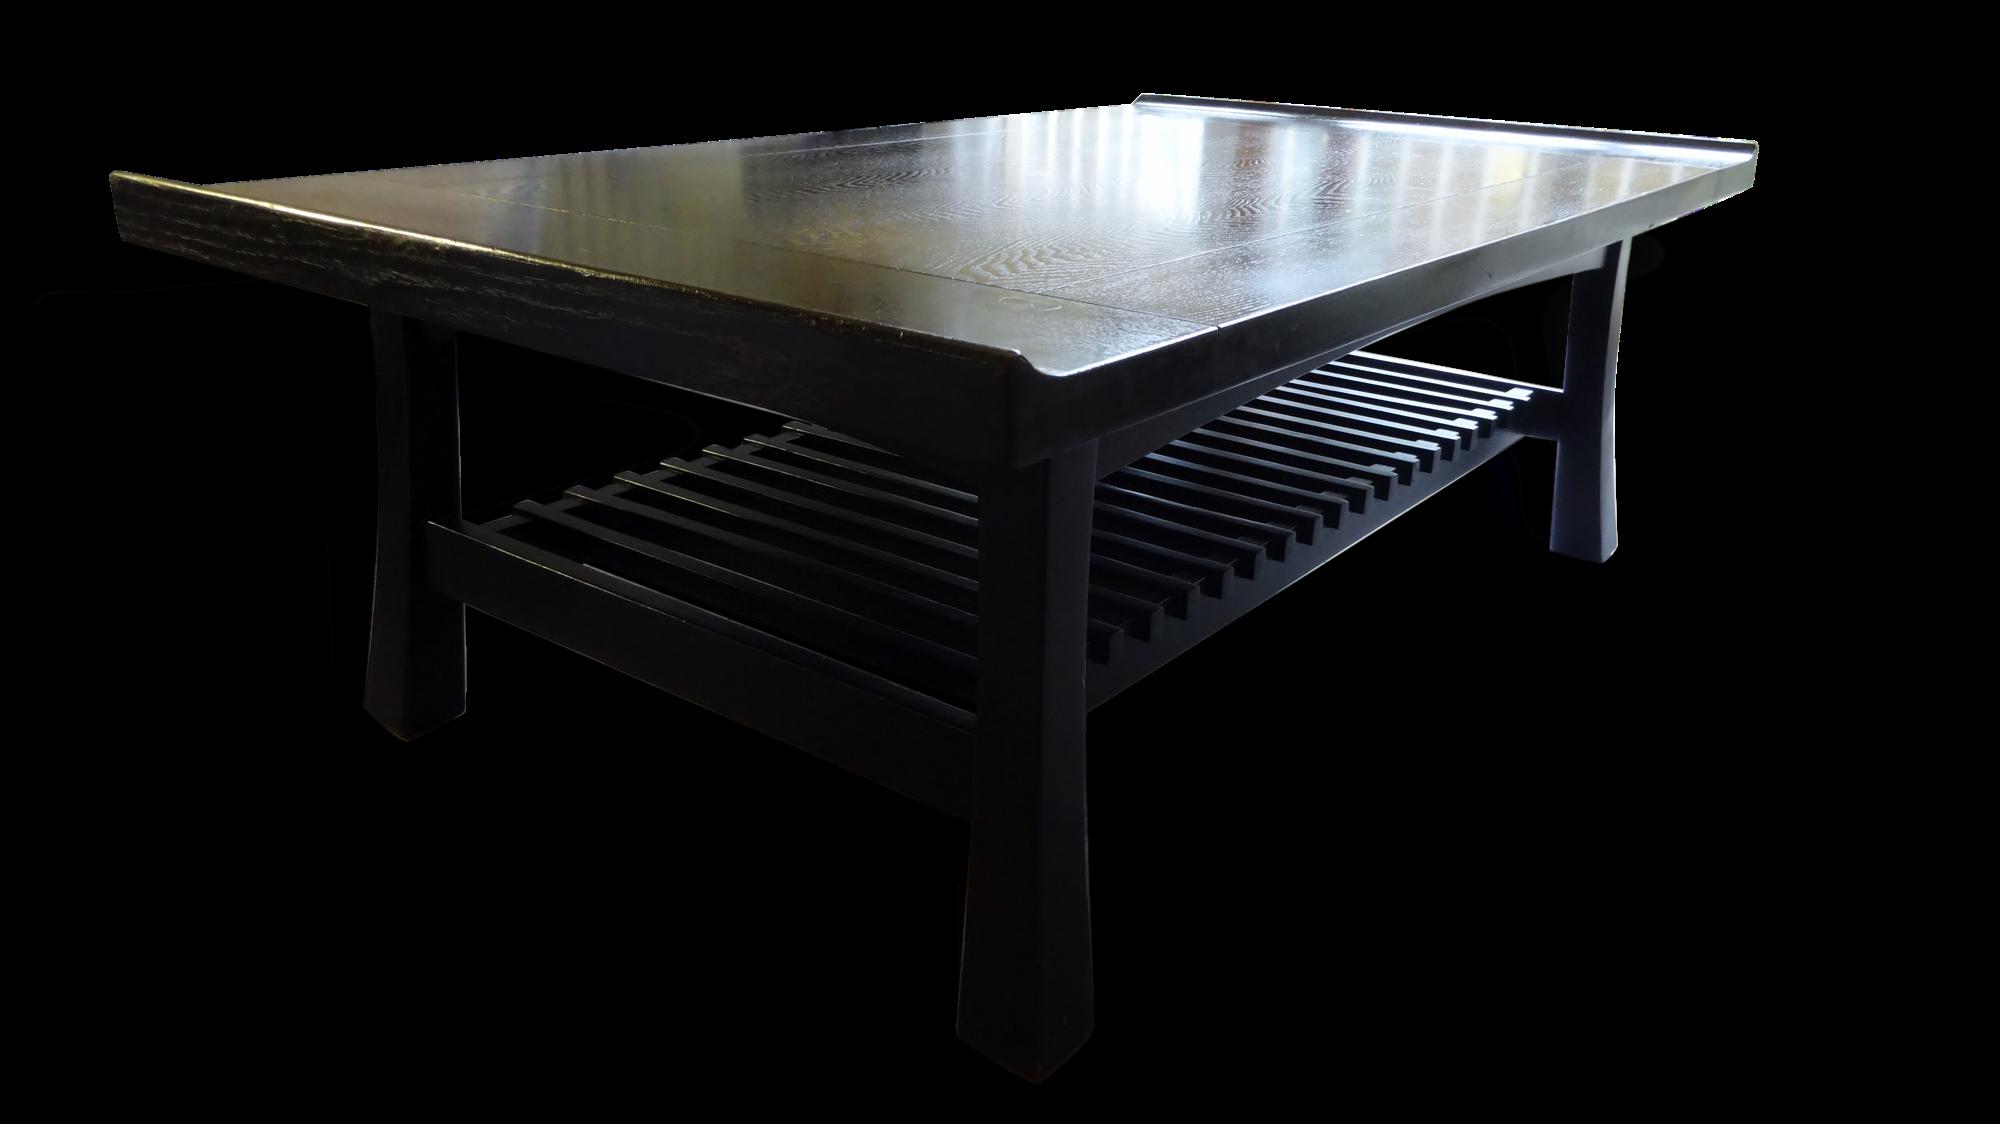 table basse bois exotique table basse bois exotique. Black Bedroom Furniture Sets. Home Design Ideas